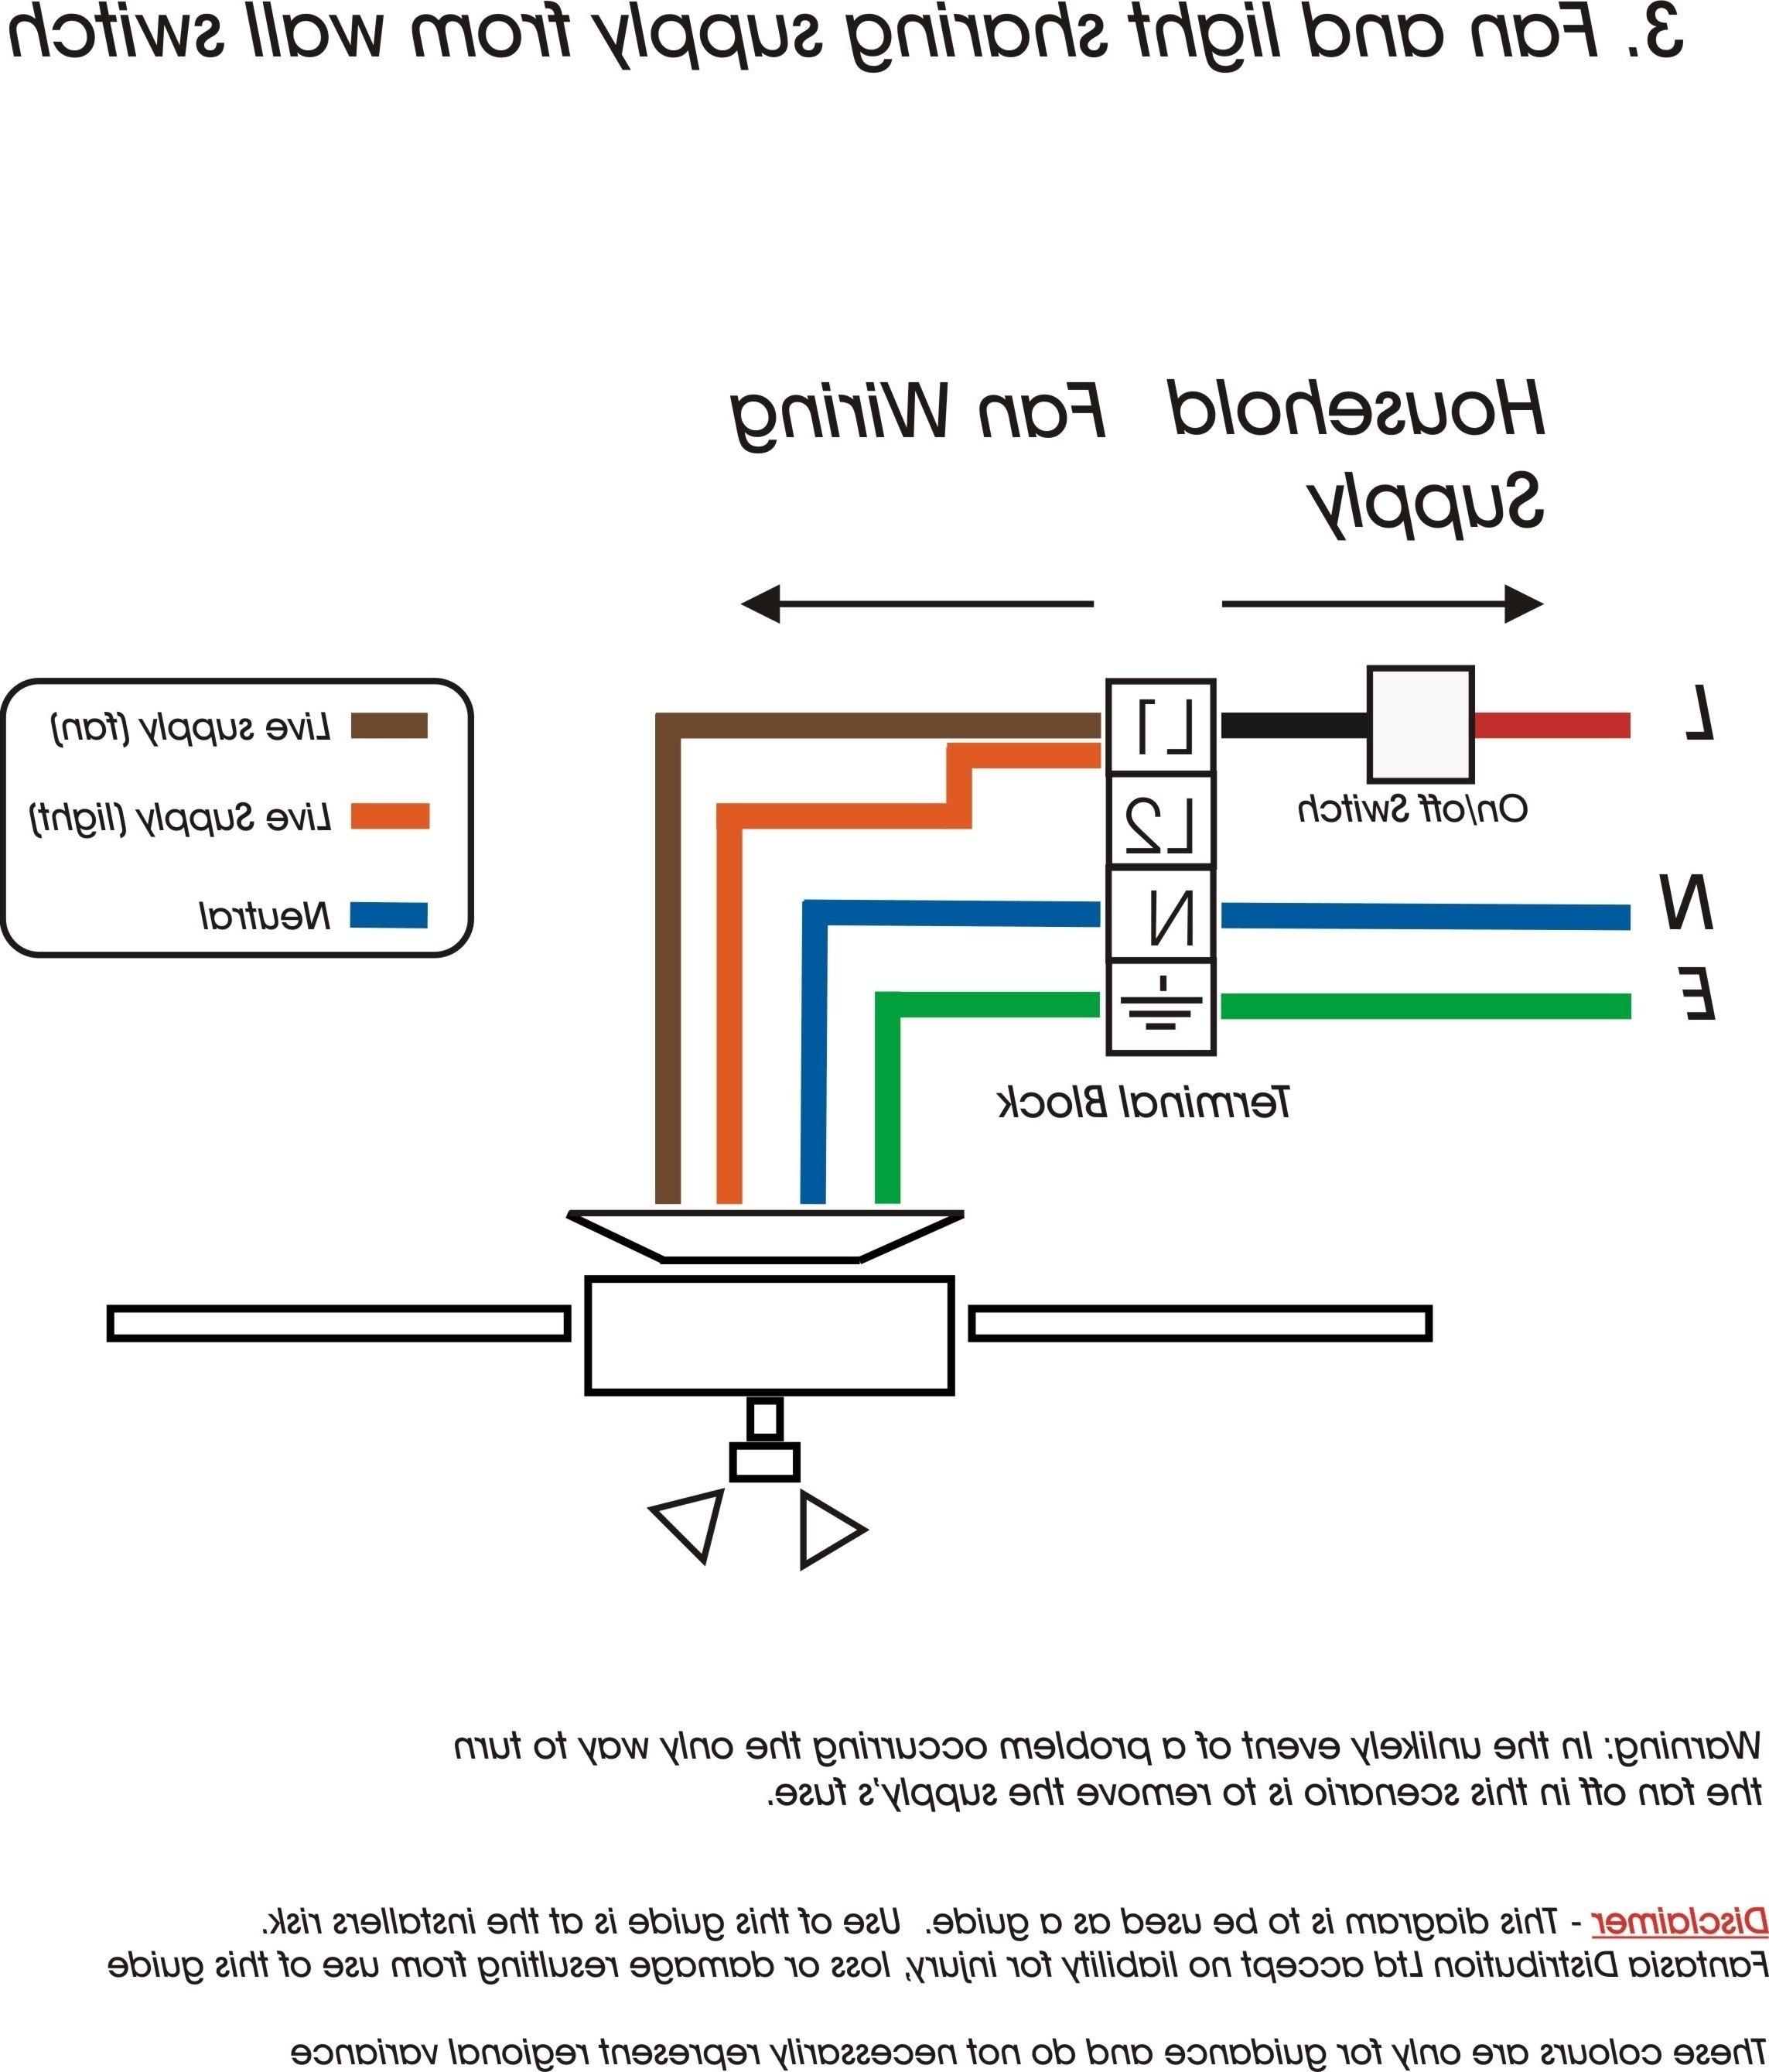 Wiring Diagram For Canarm Exhaust Fan Fresh Wiring Diagram For Hampton Bay Ceiling Fan Fresh At Deltagenerali